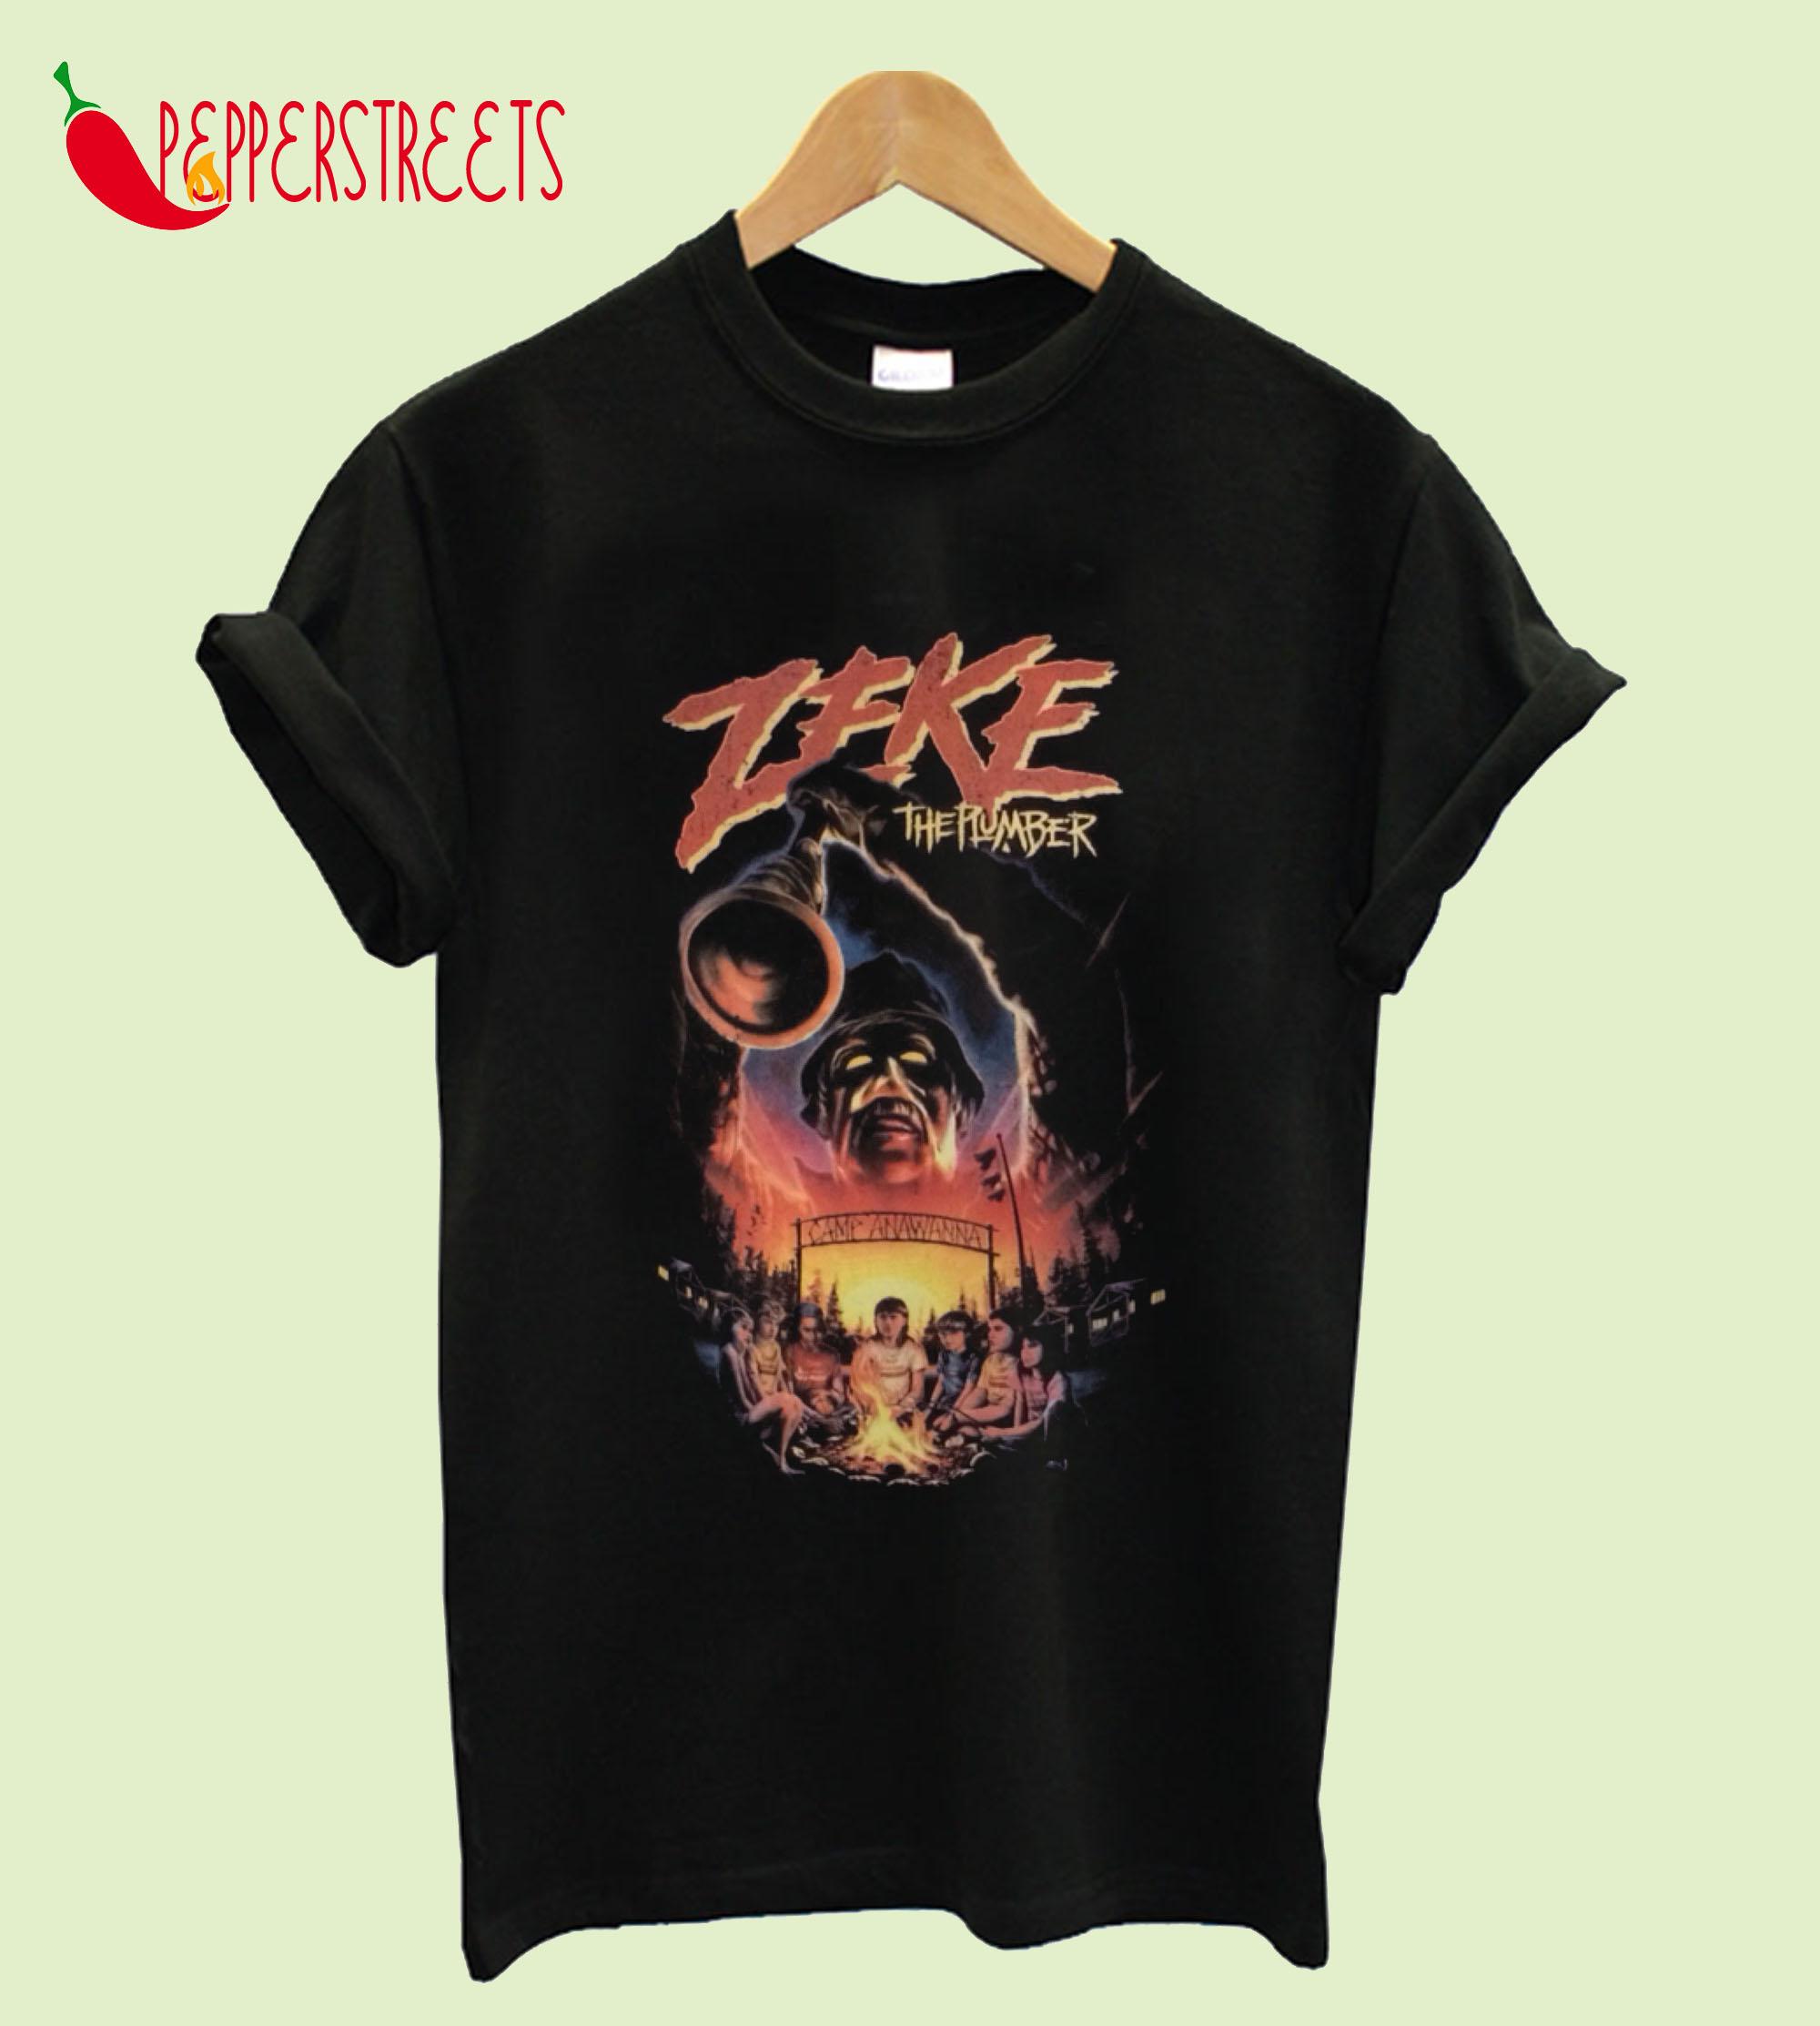 Zeke Antiseen Against T-Shirt